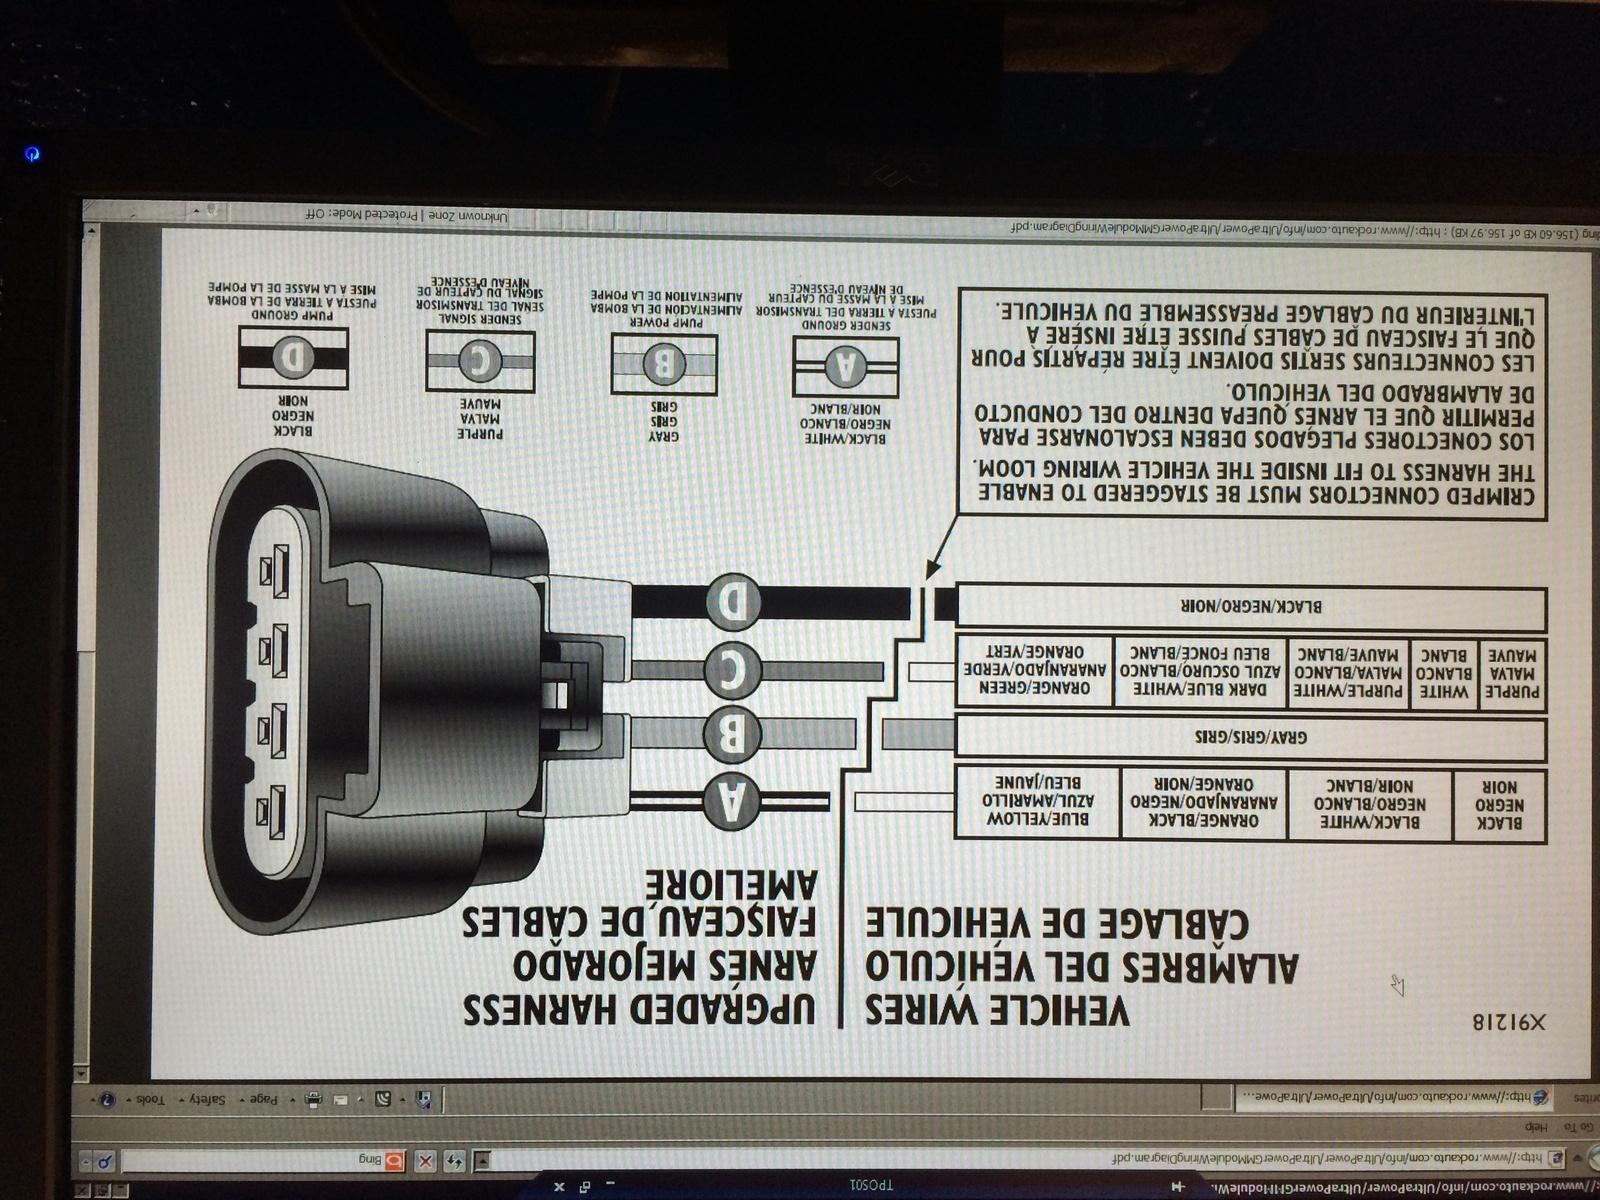 Gmc Sierra 1500 Questions - Fuel Pump Not Engaging On 1998 Gmc K1500 - 1990 Chevy 1500 Fuel Pump Wiring Diagram